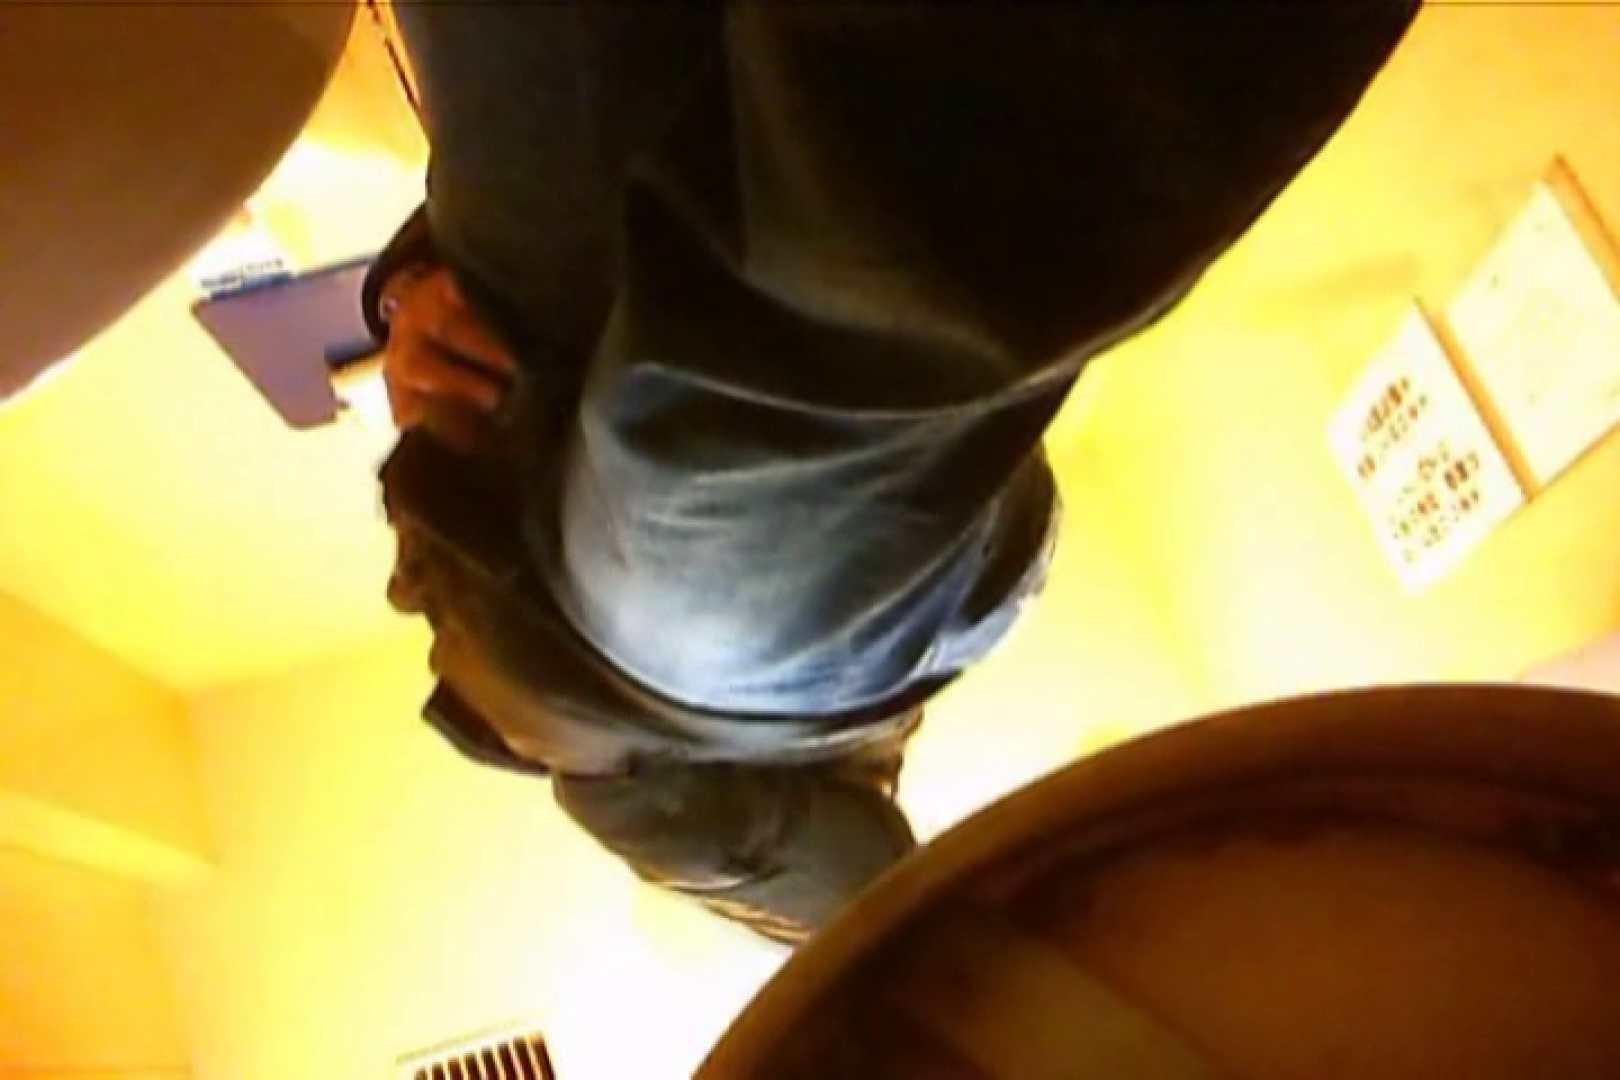 SEASON 2ND!掴み取りさんの洗面所覗き!in新幹線!VOL.13 リーマン系ボーイズ | 人気シリーズ  80pic 6